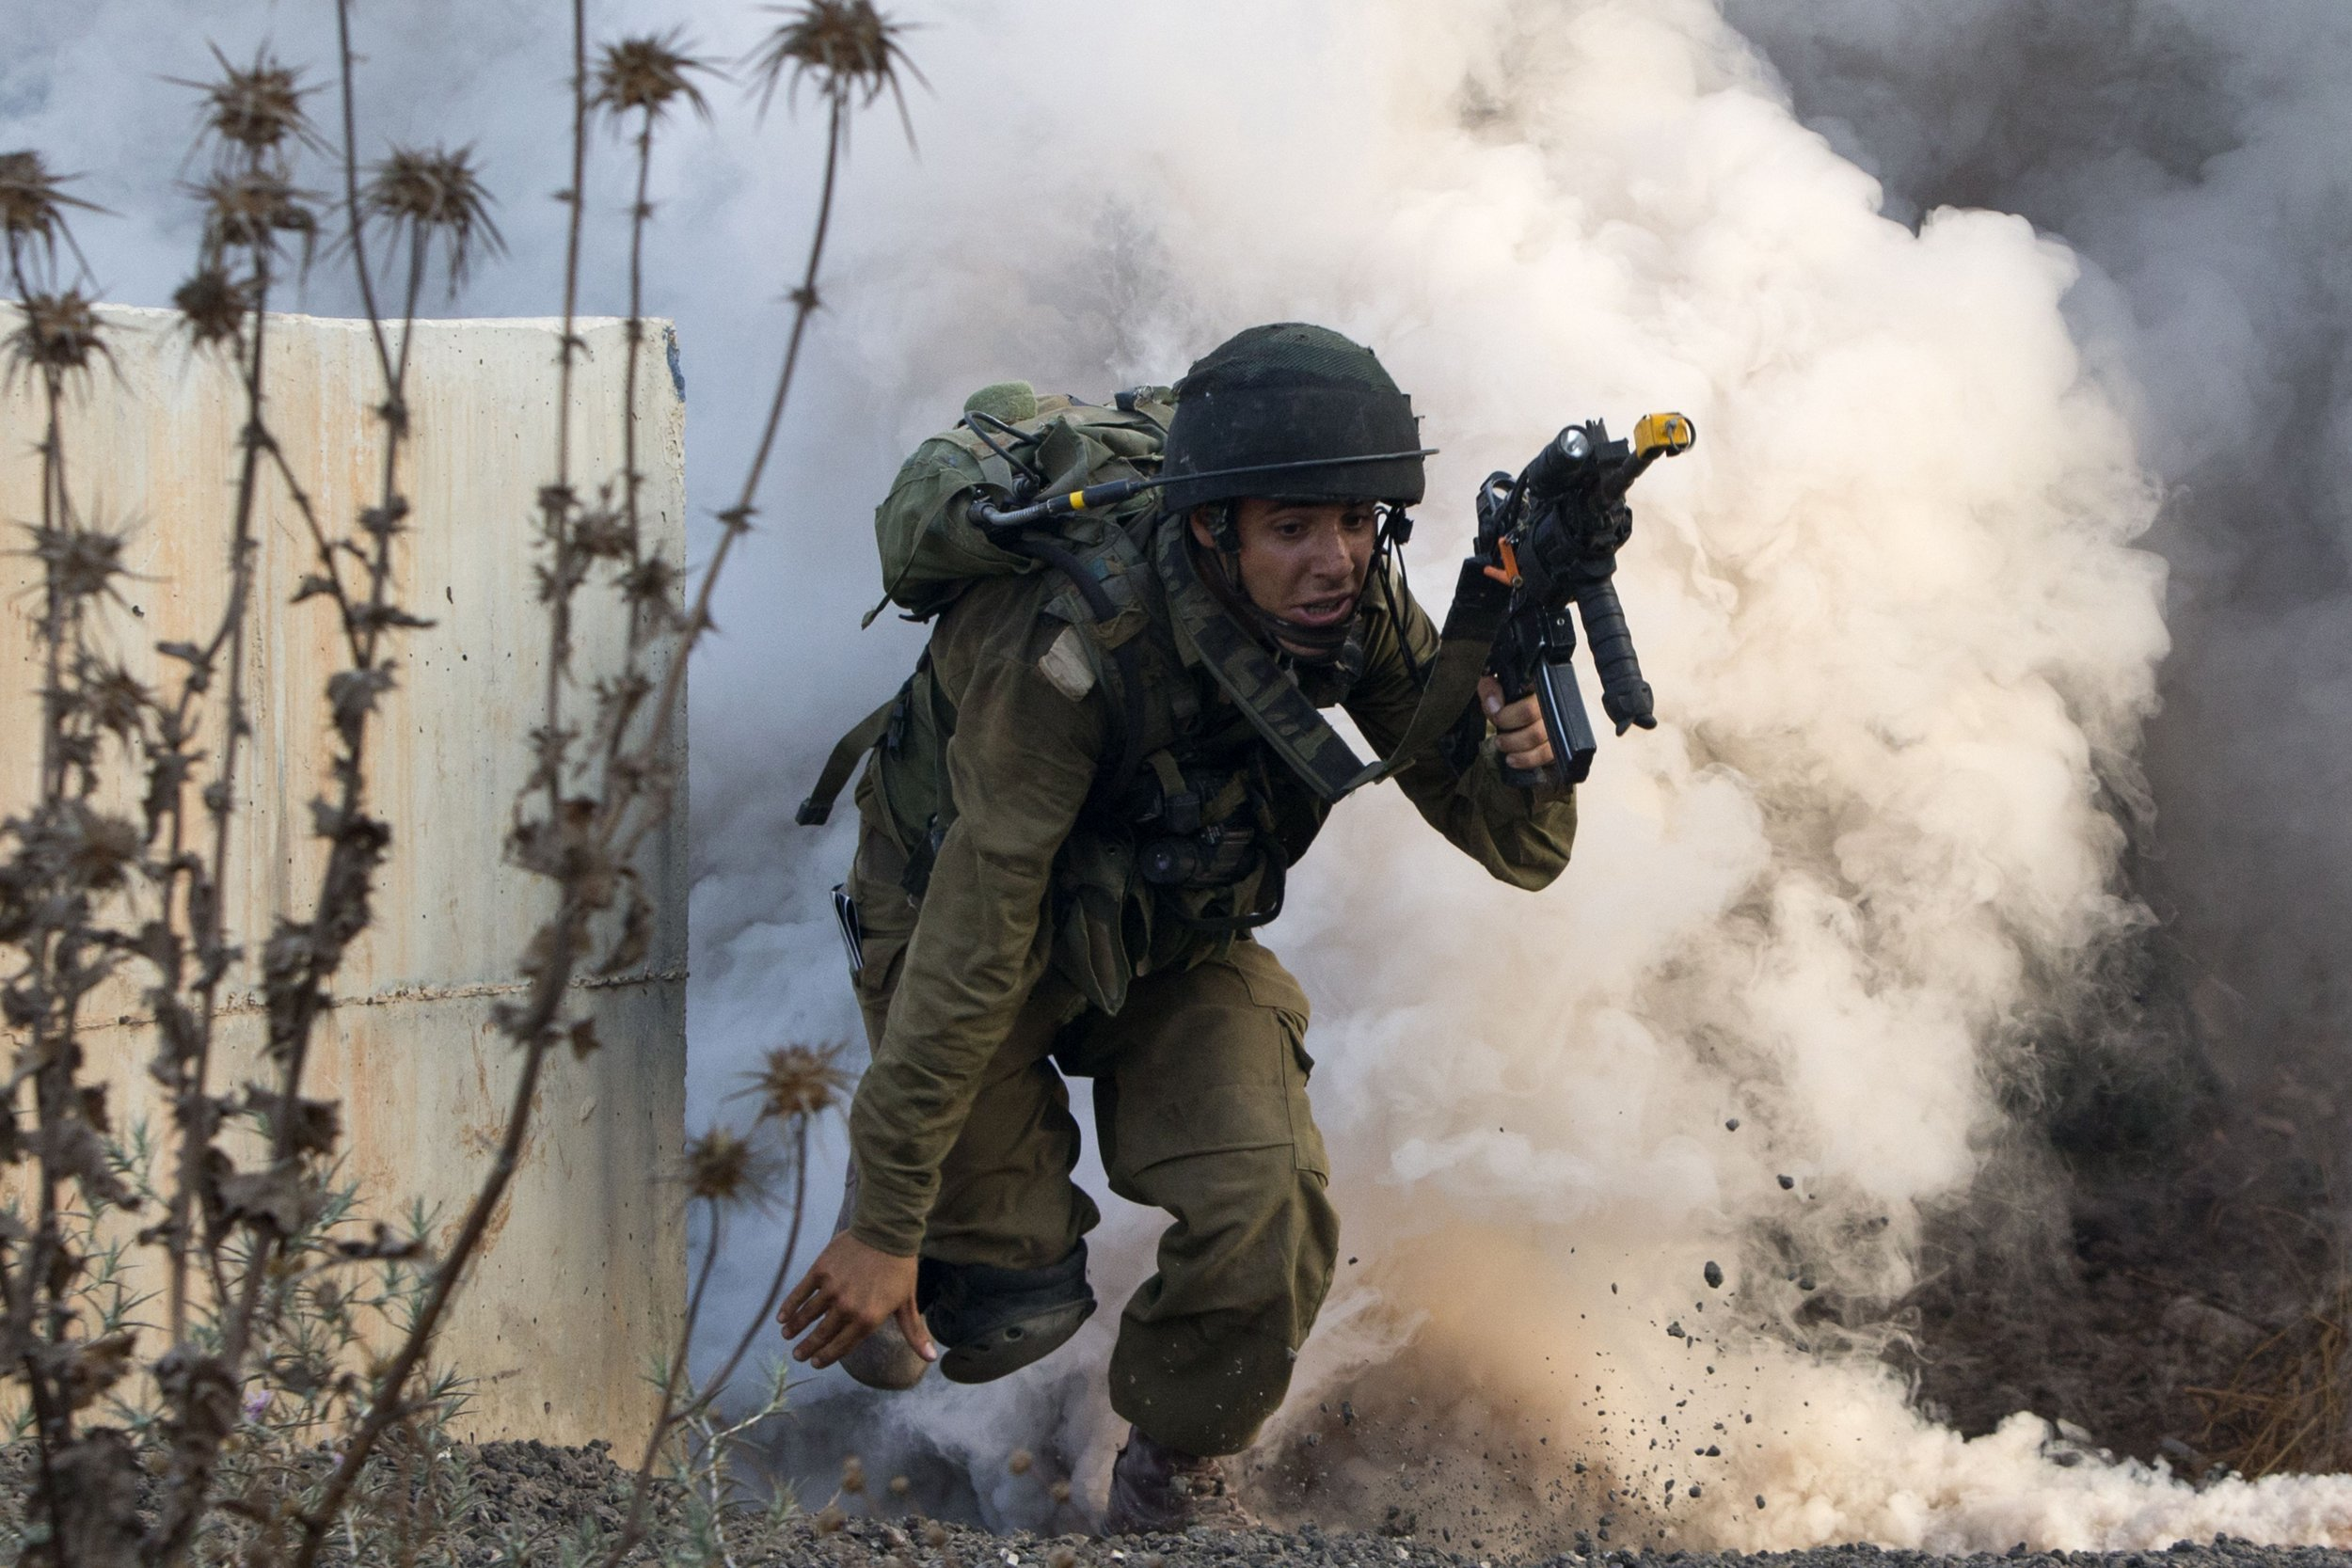 Israeli infantry simulating combat with Hezbollah